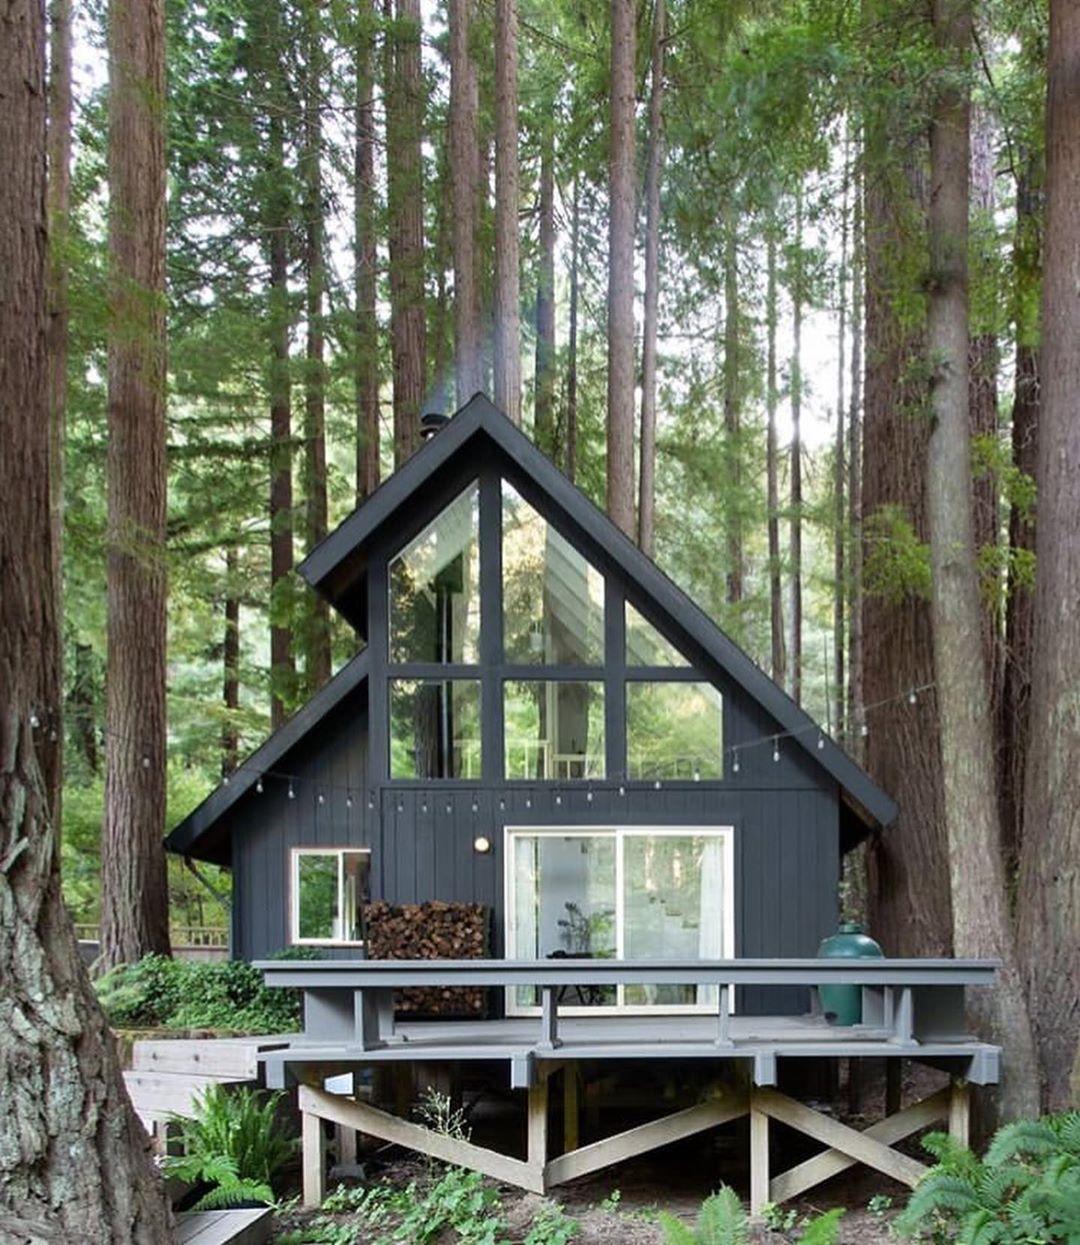 2 bedroom kit cabin with loft